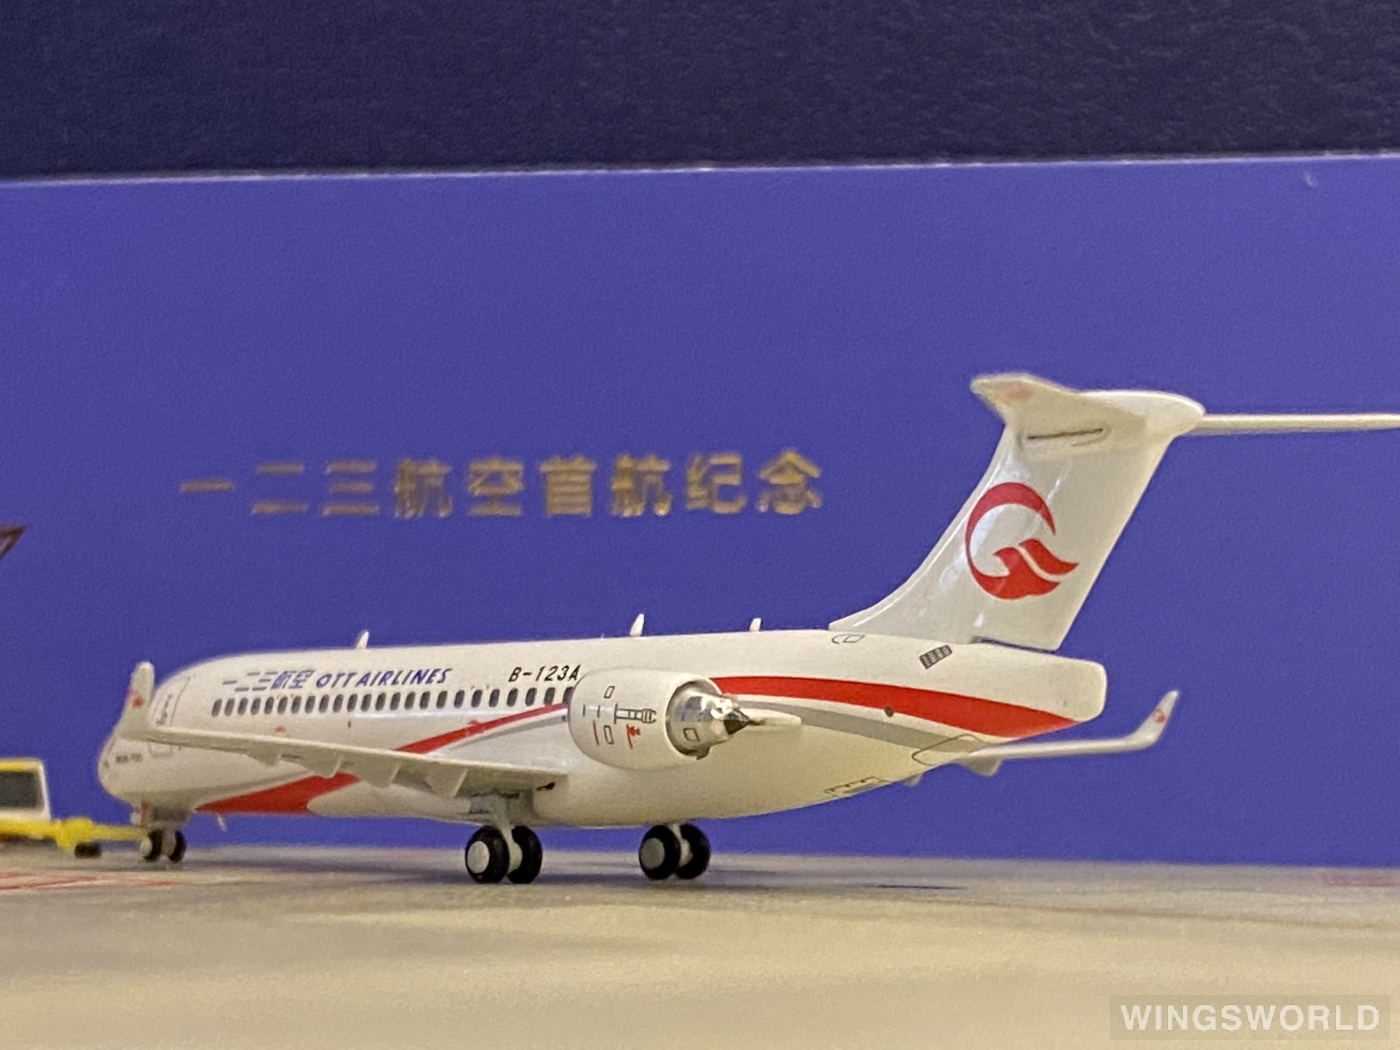 Ngmodel 1:400 NG21012 OTT Airlines 一二三航空 Comac ARJ21-700 B-123A